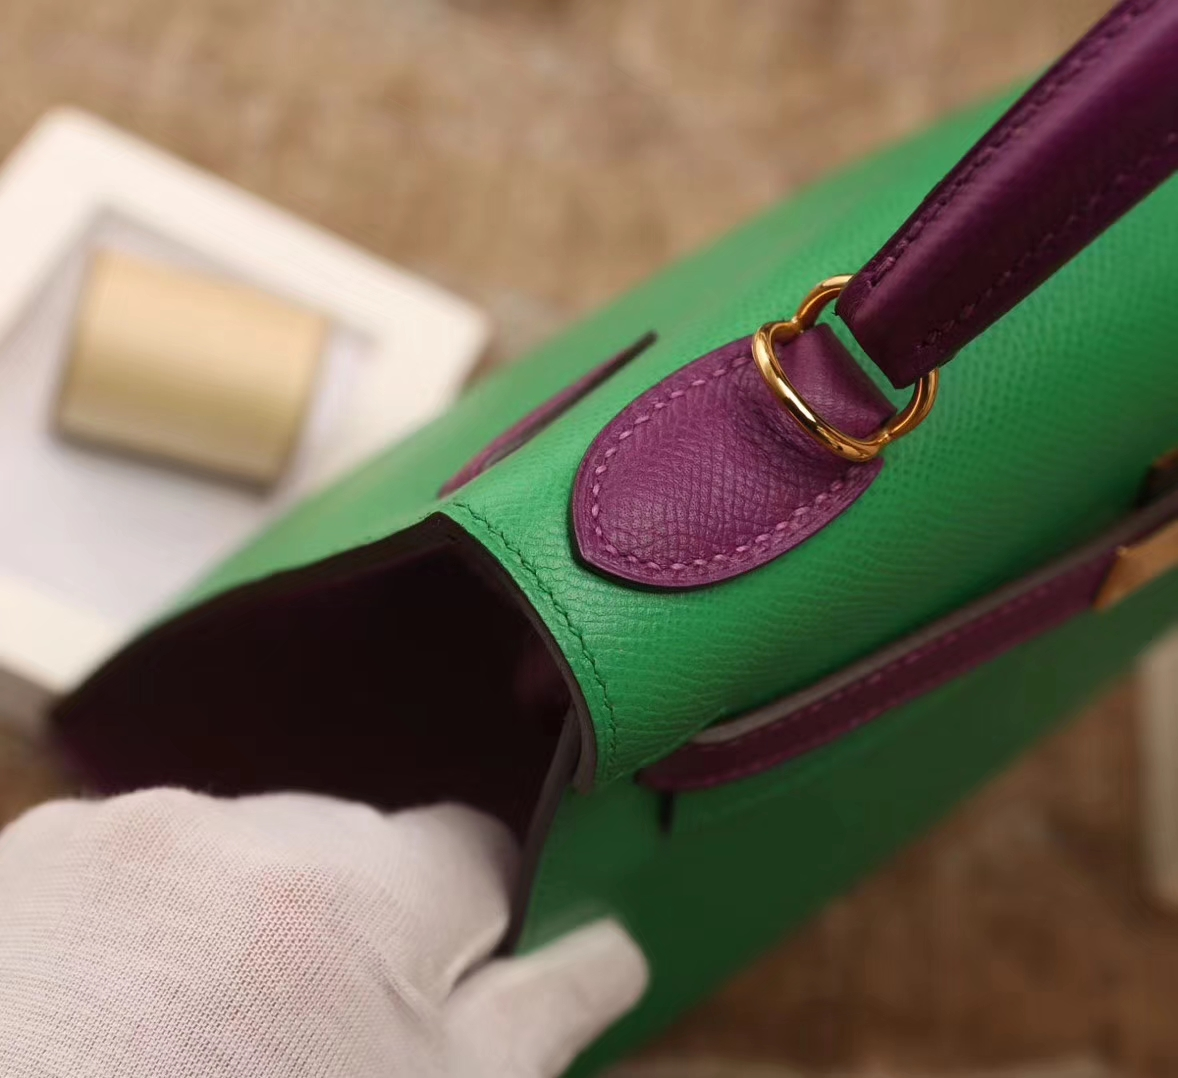 Hermes爱马仕 Kelly 28 1K竹子绿拼P9海葵紫 原厂御用顶级Epsom皮 外缝 金扣